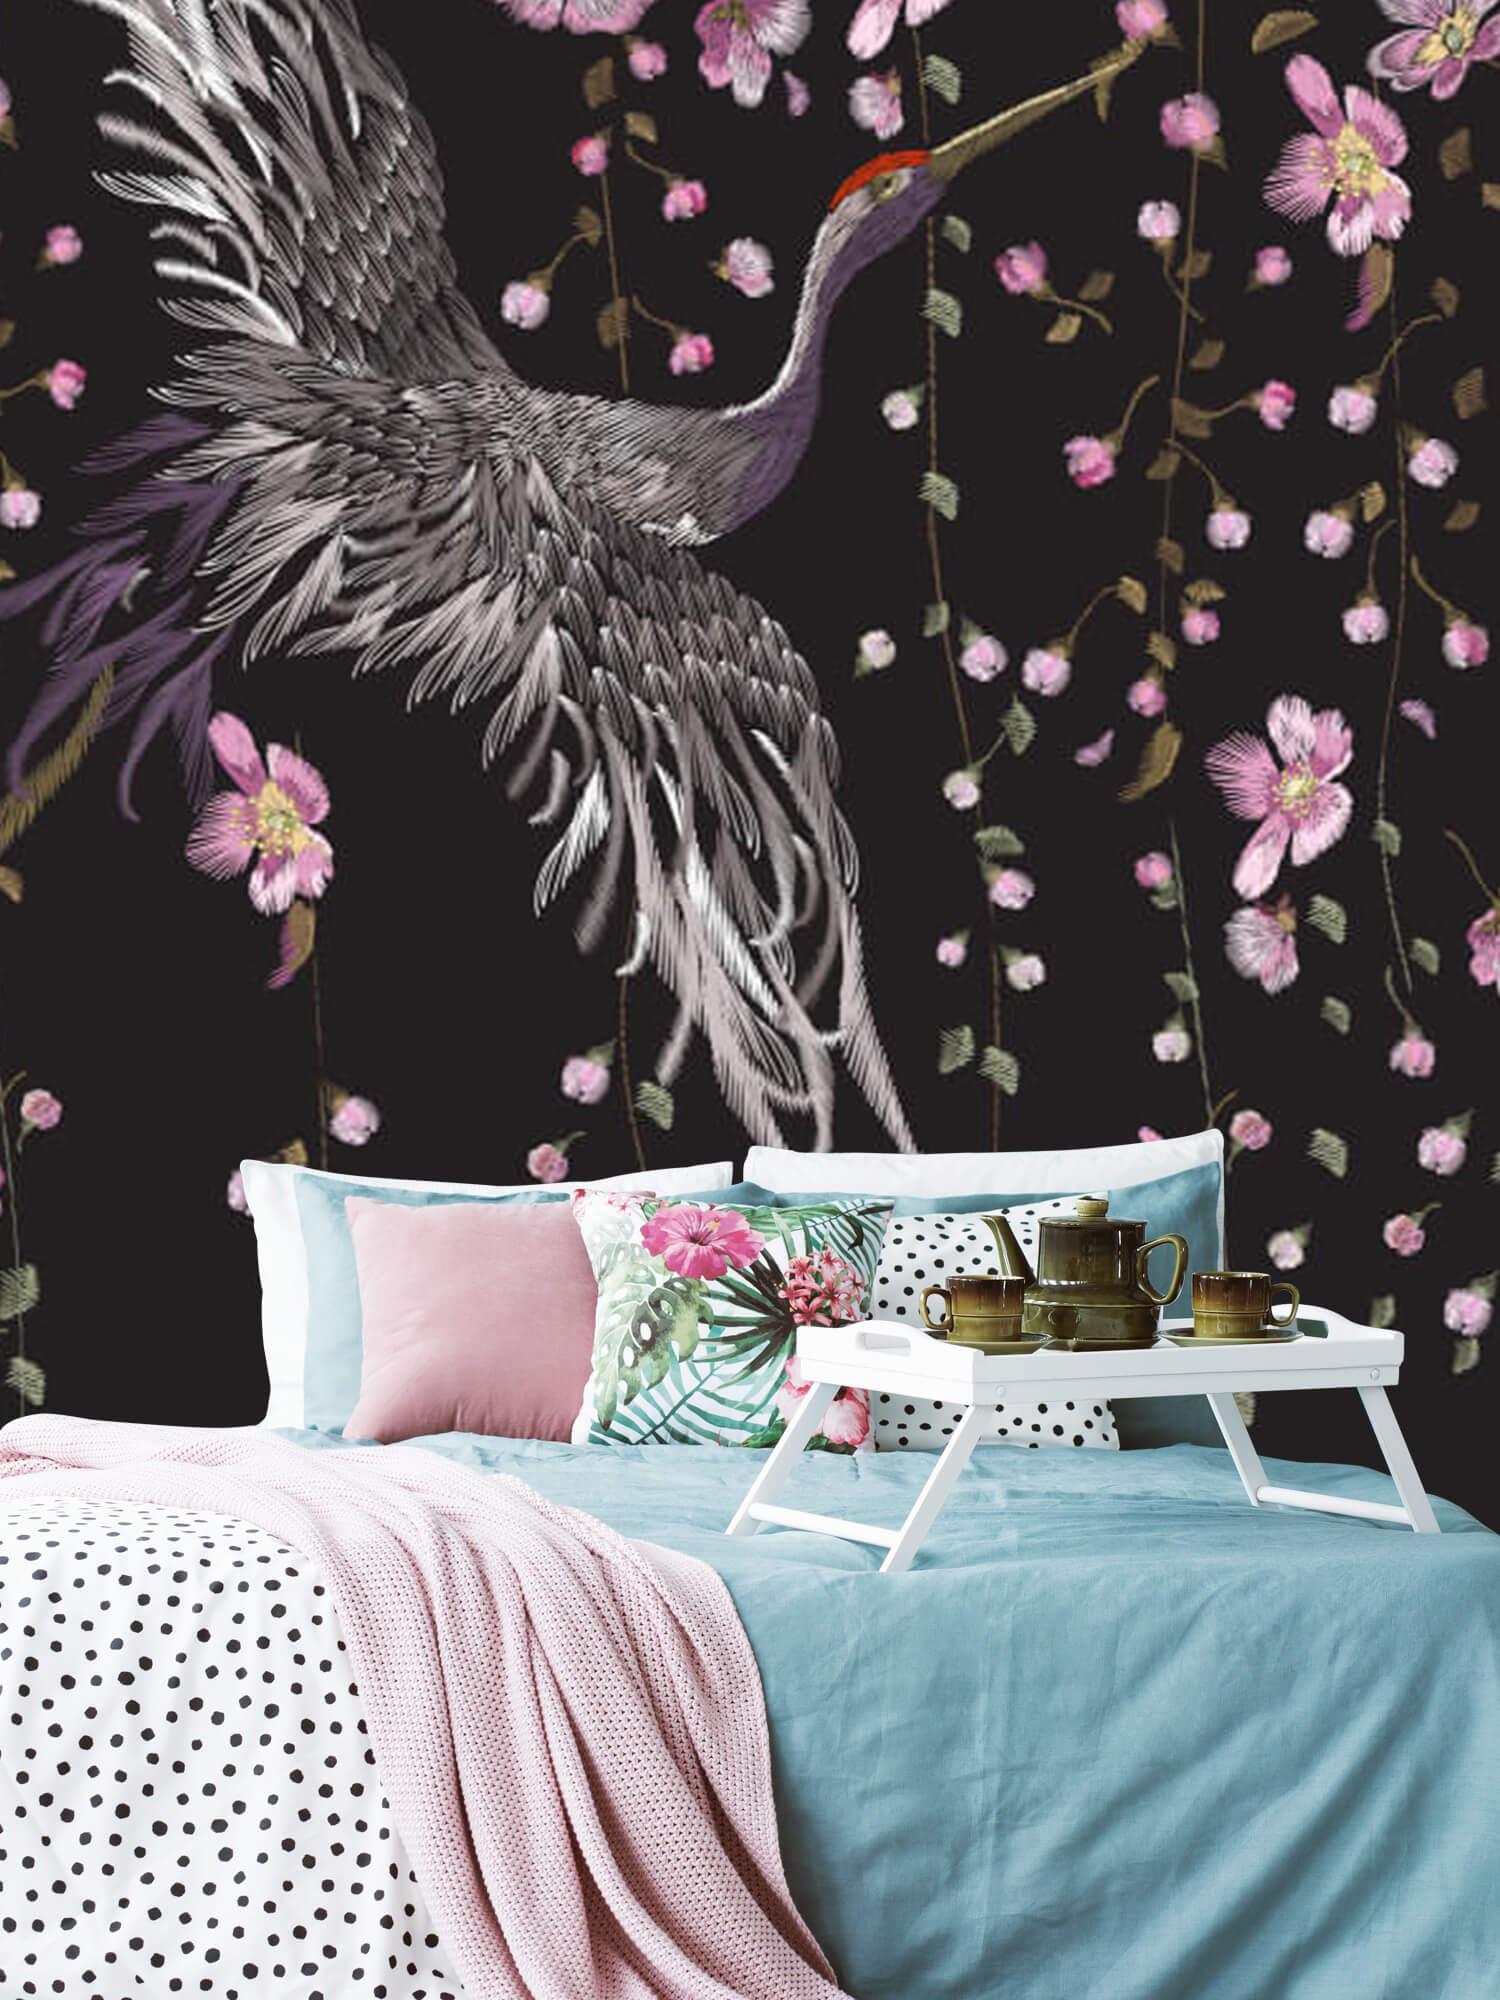 pattern Kraanvogel bij roze bloemen 3